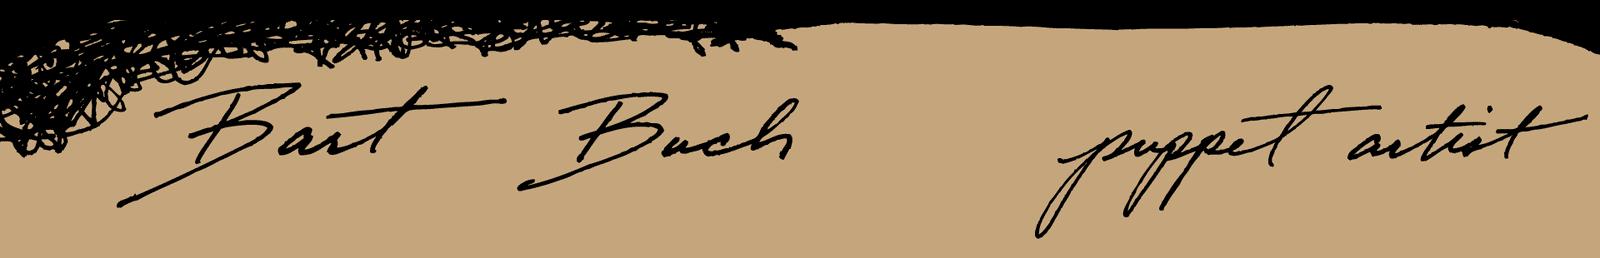 Bart Buch